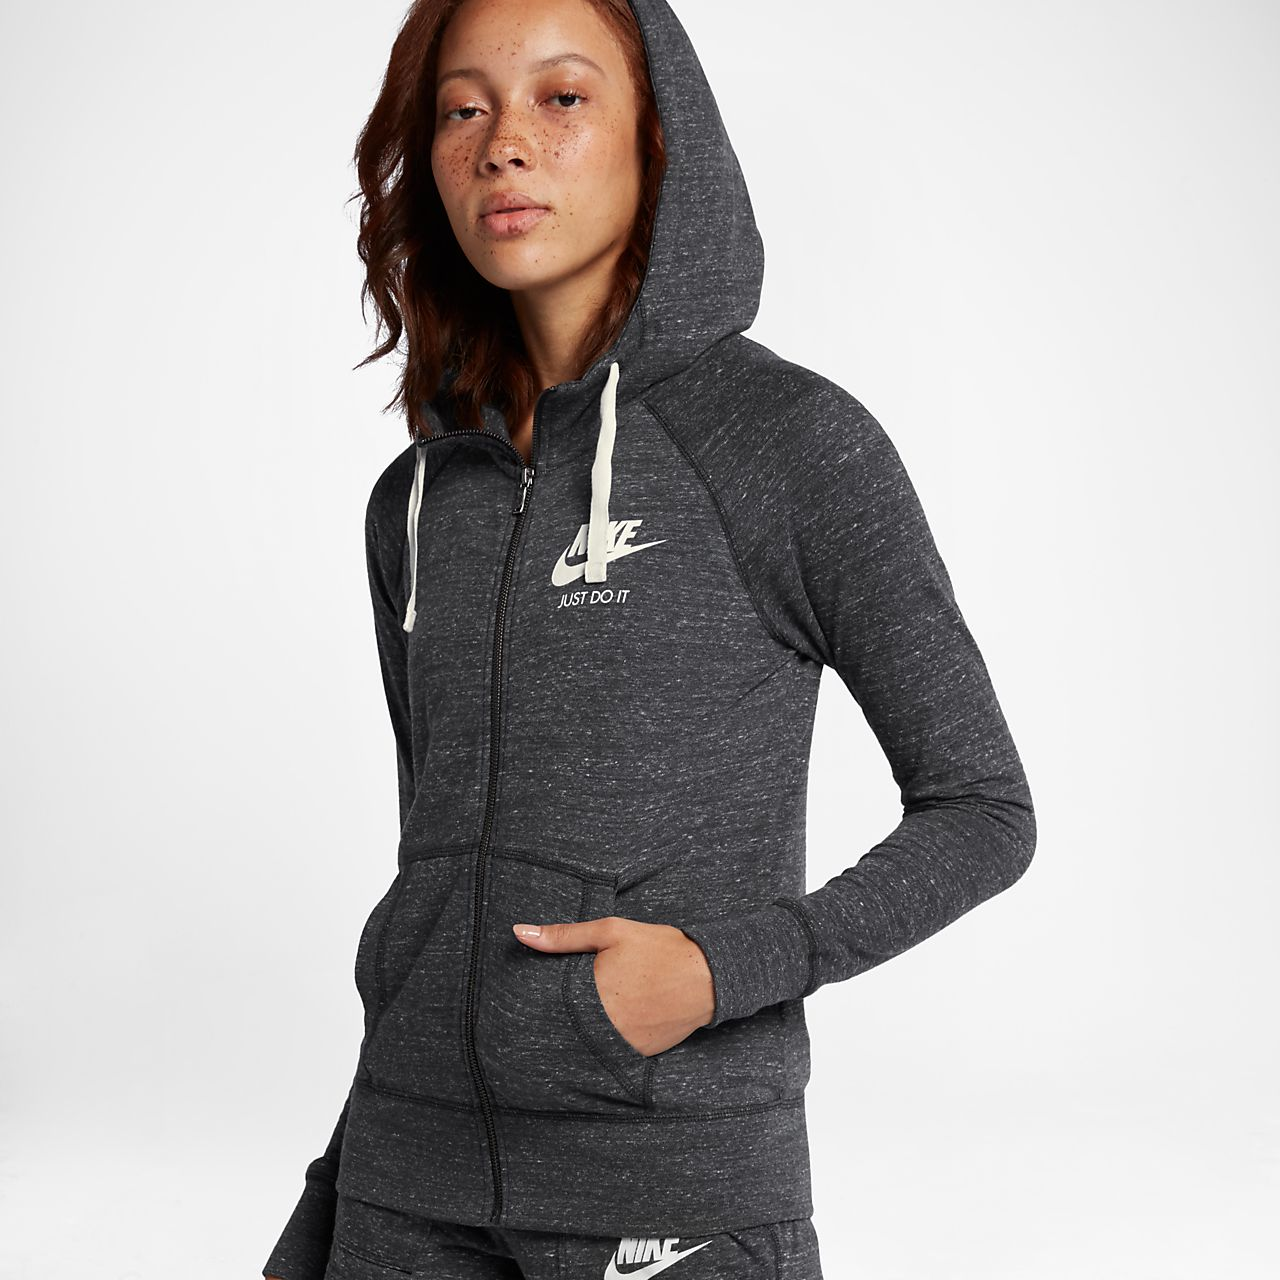 Hoodie com fecho completo Nike Sportswear Gym Vintage para mulher